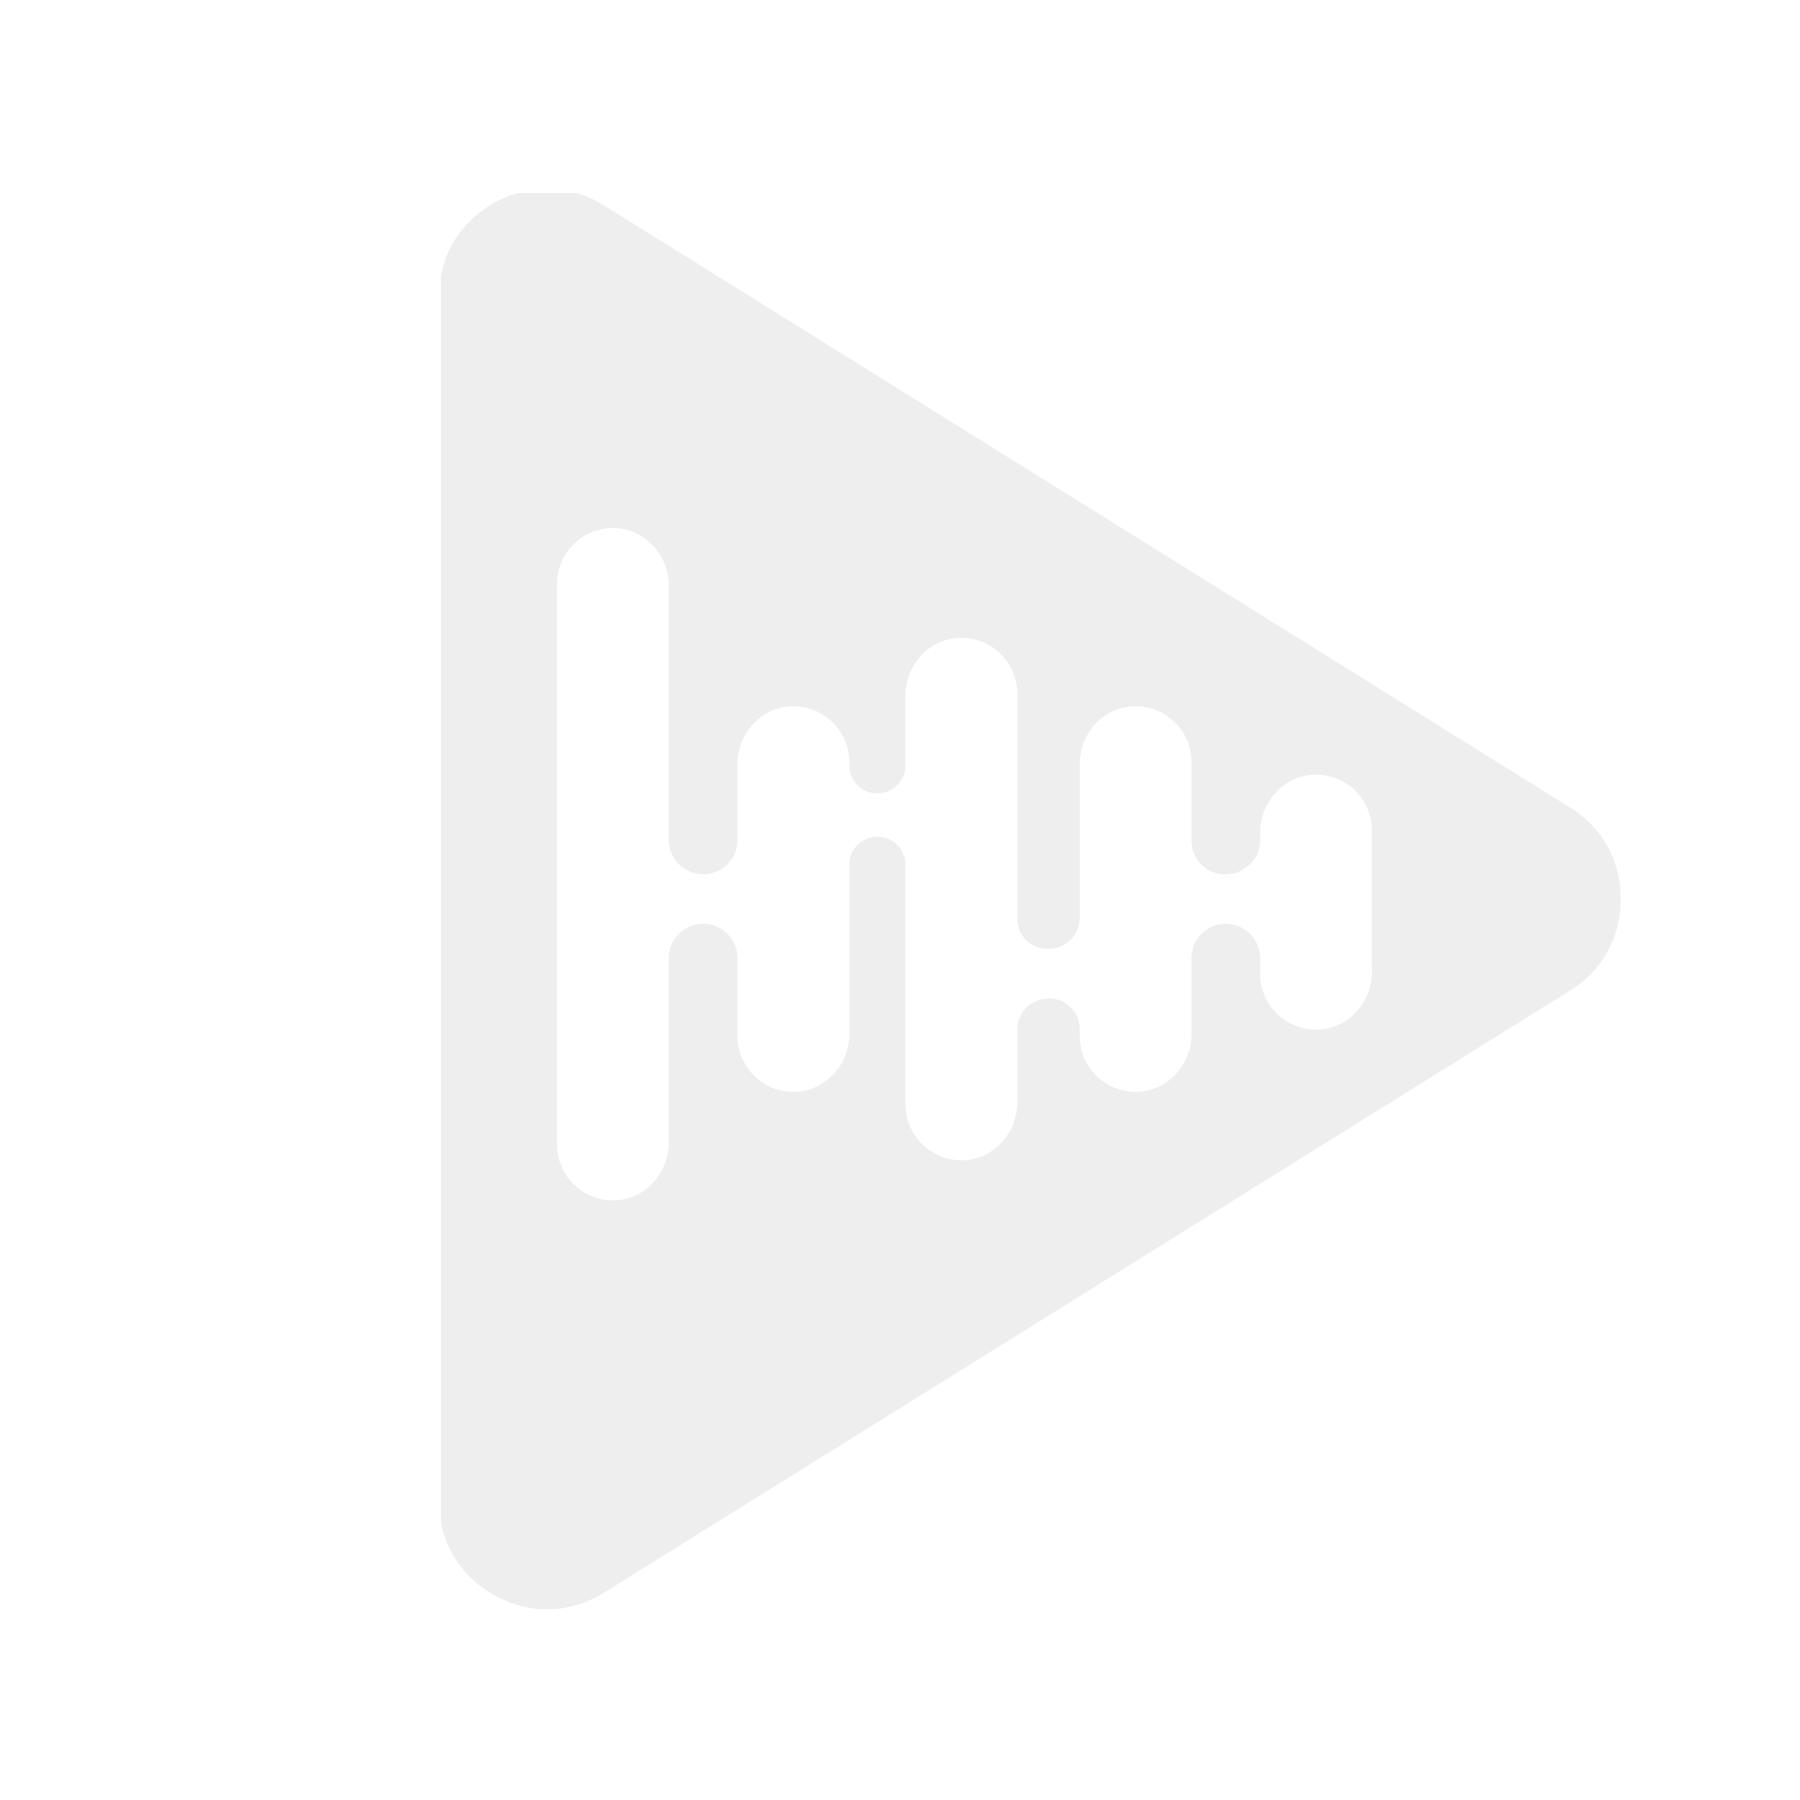 Audison APBMW-E92-HIFI